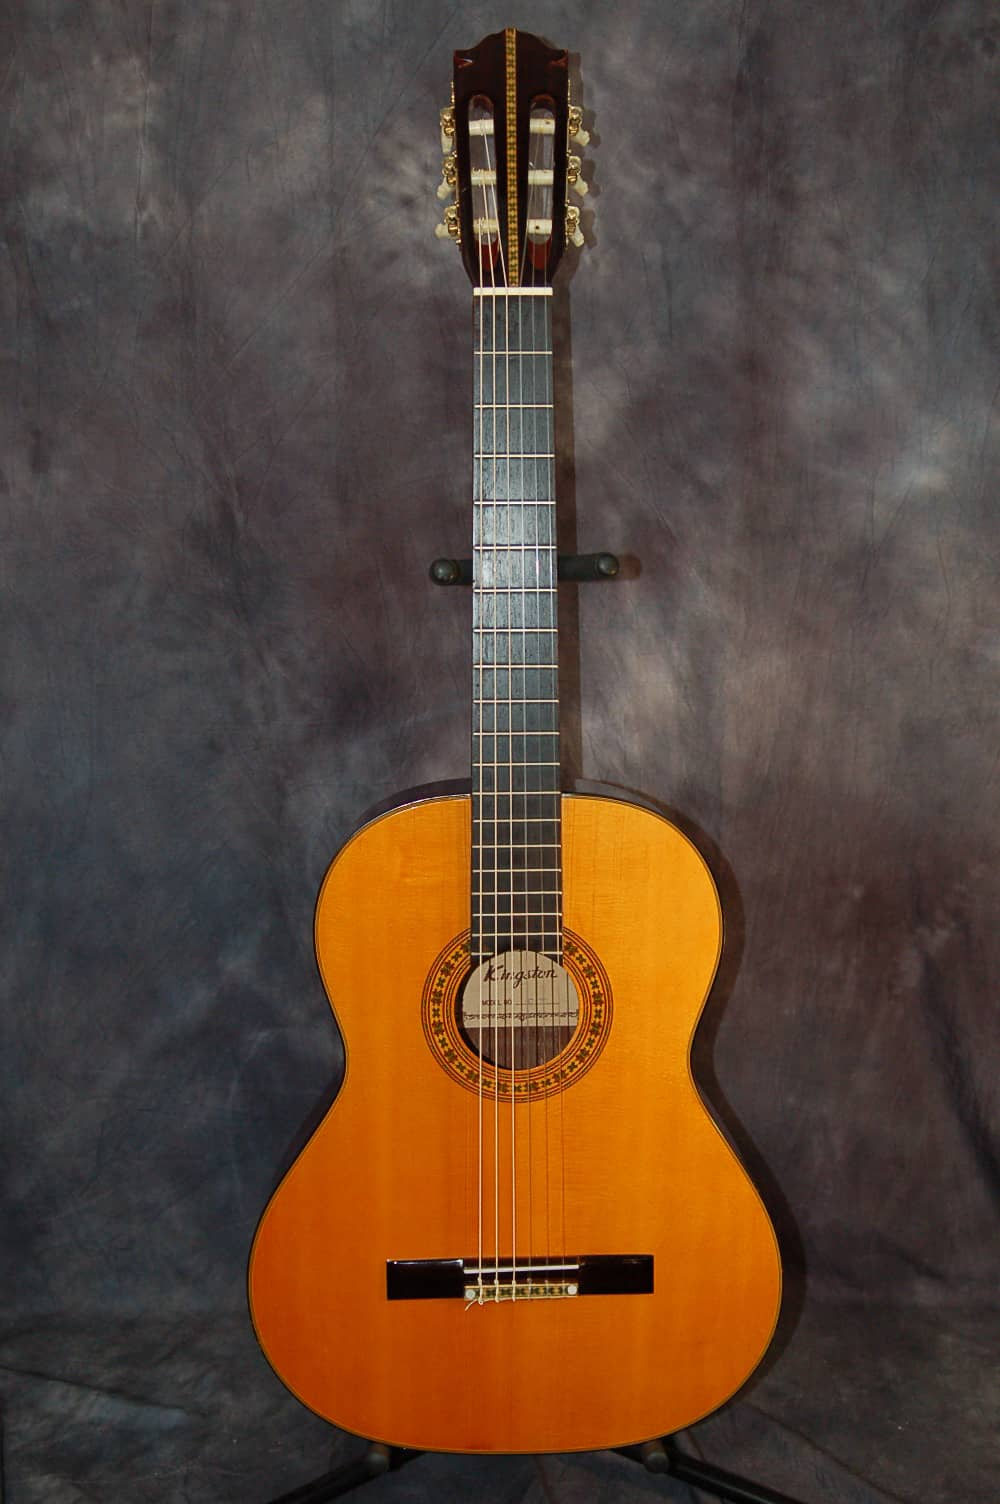 kingston model c 70 classical guitar 1970 39 s natural original reverb. Black Bedroom Furniture Sets. Home Design Ideas